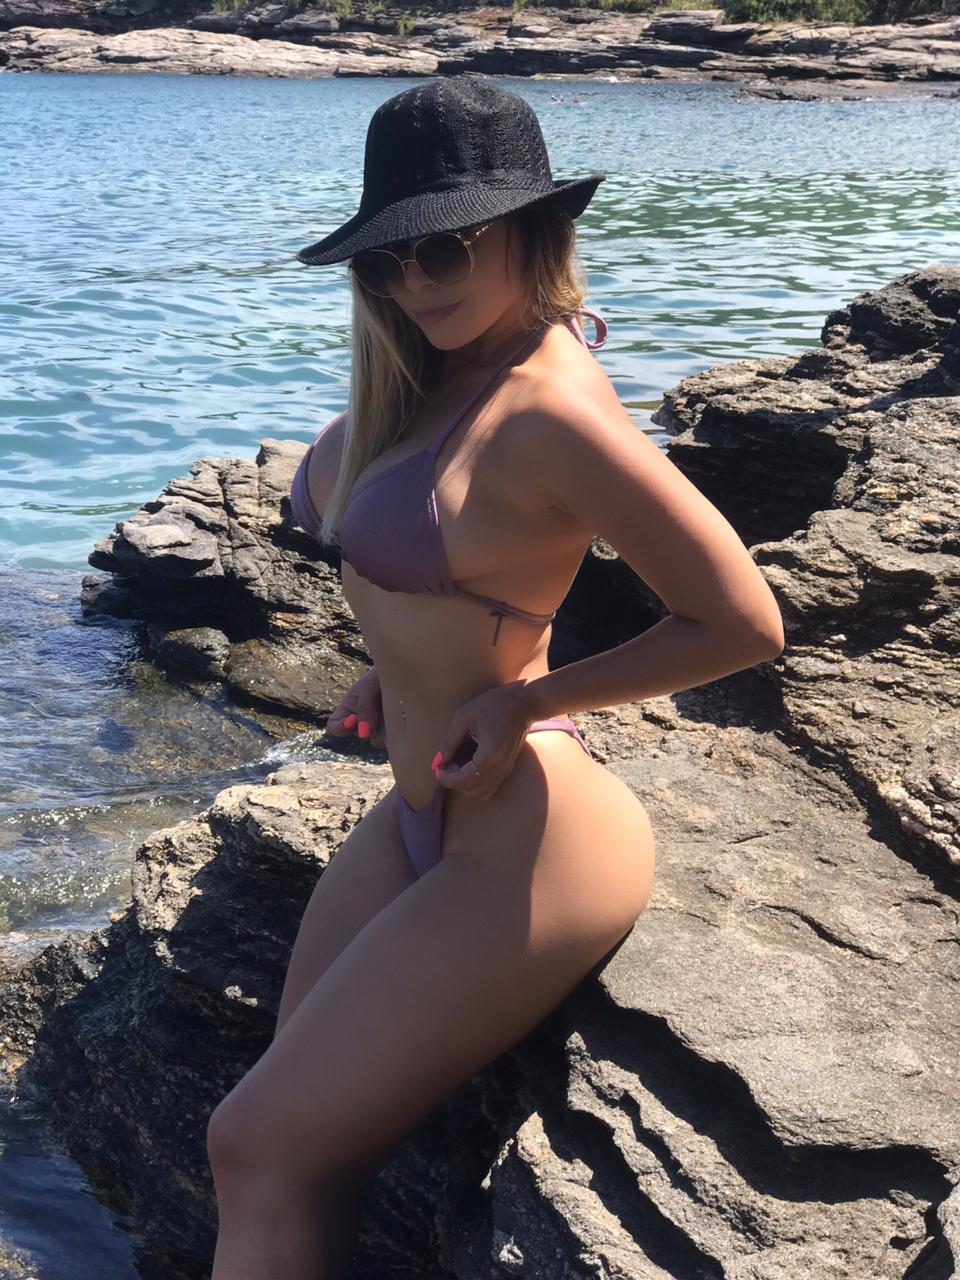 Brenda Stefani posa de biquíni em Búzios e arrasa na web